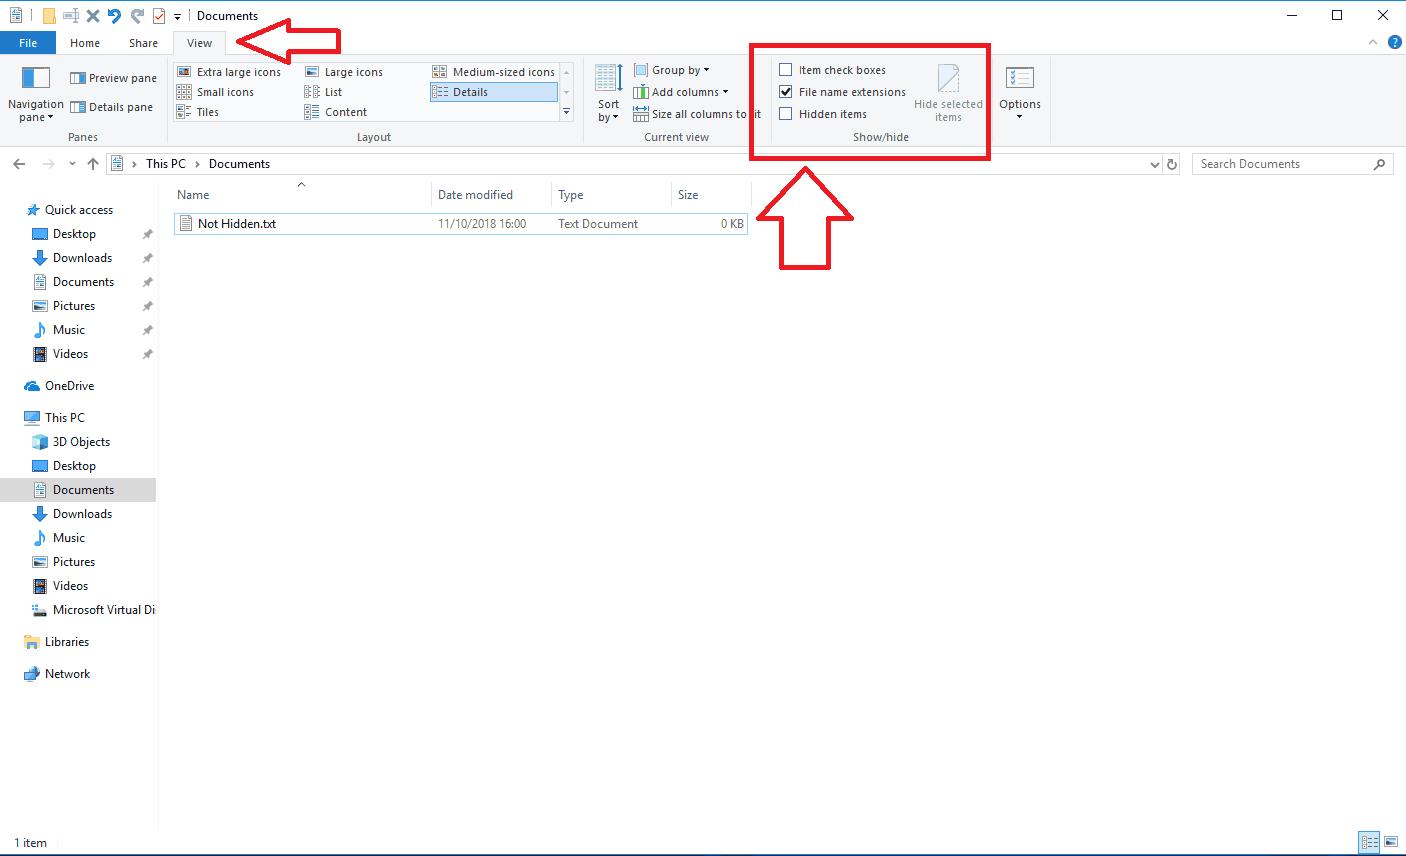 Enabling hidden files